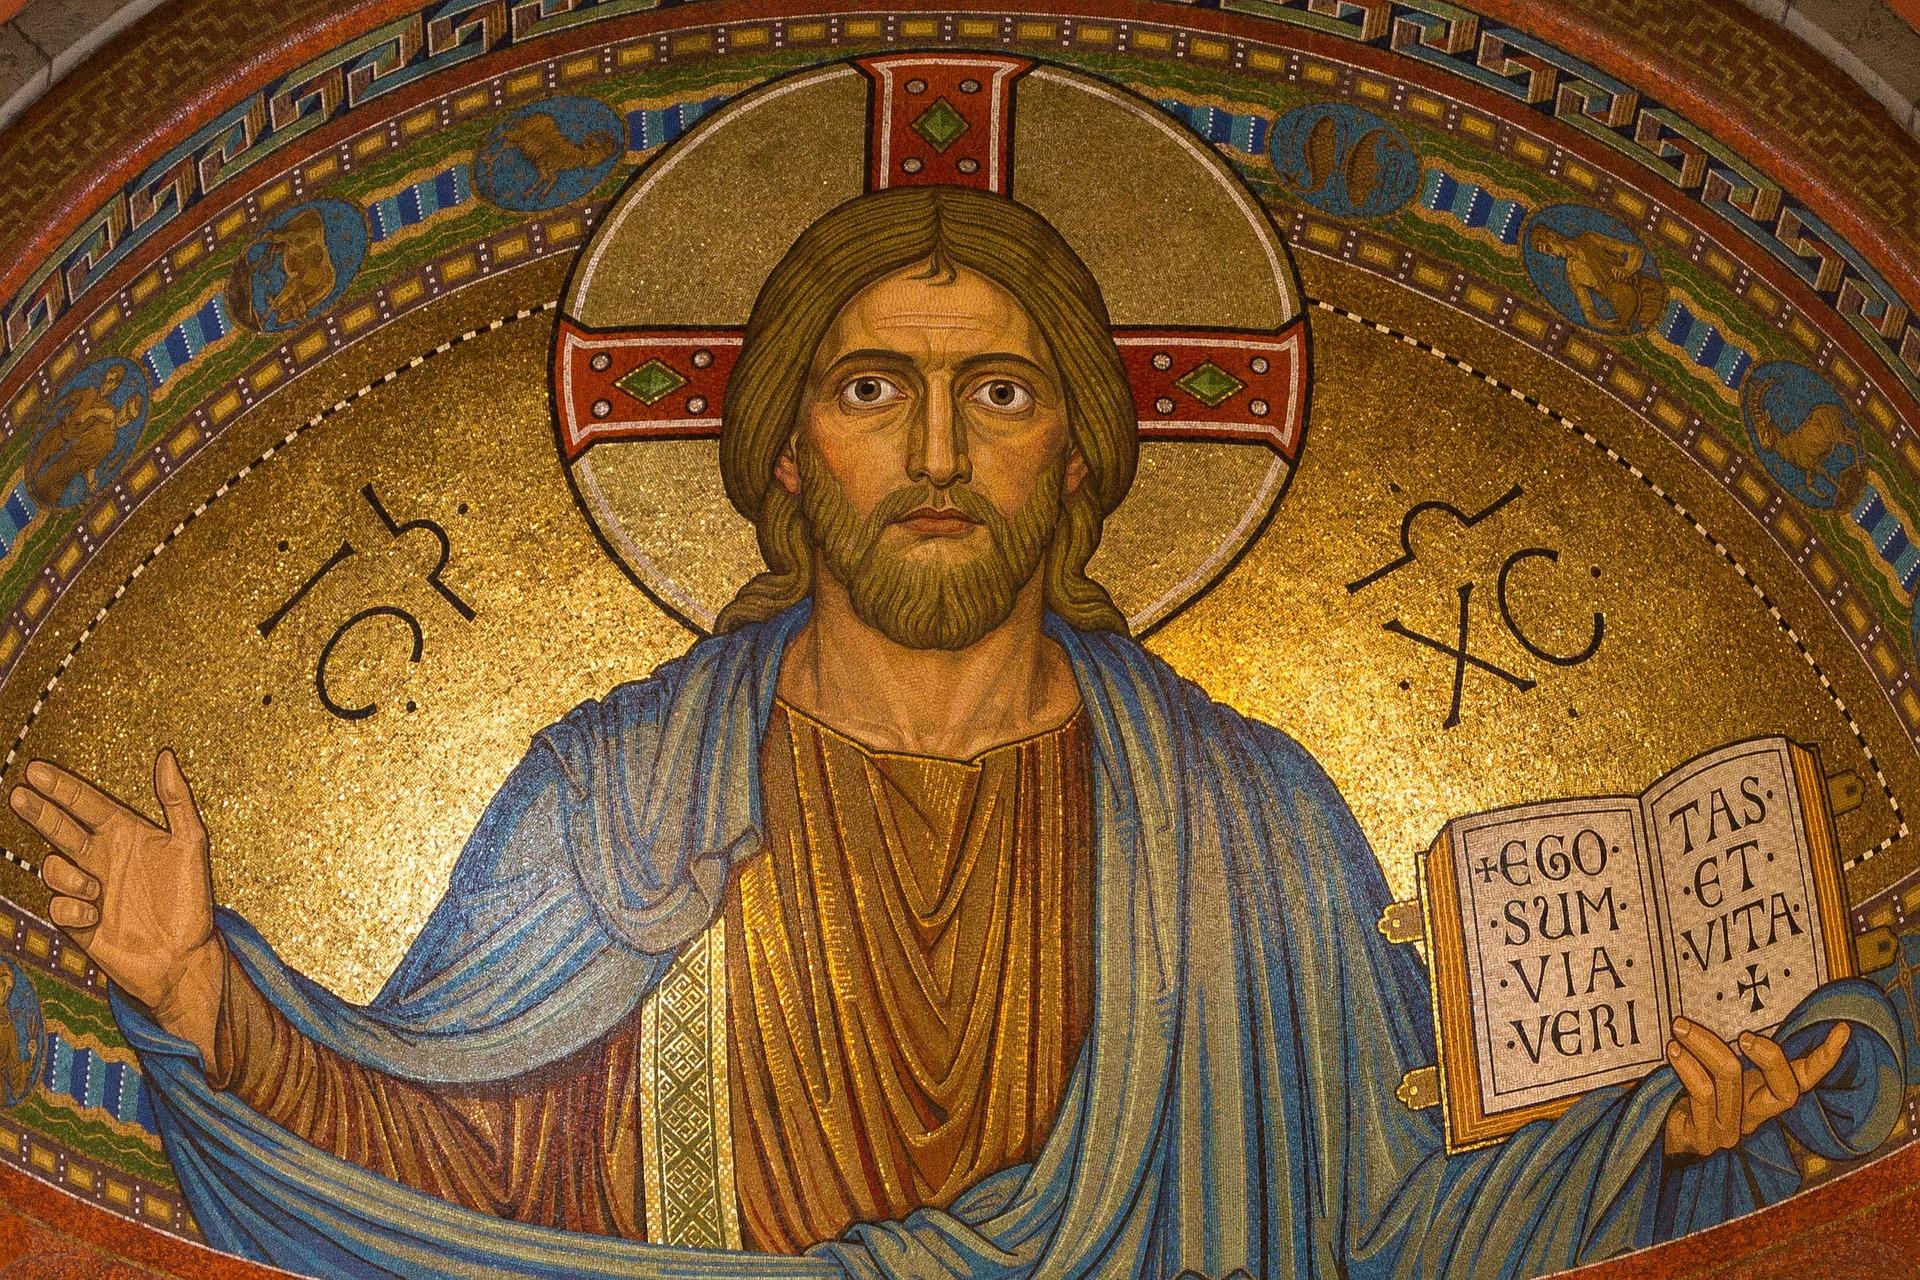 christ-898330_1920.jpg